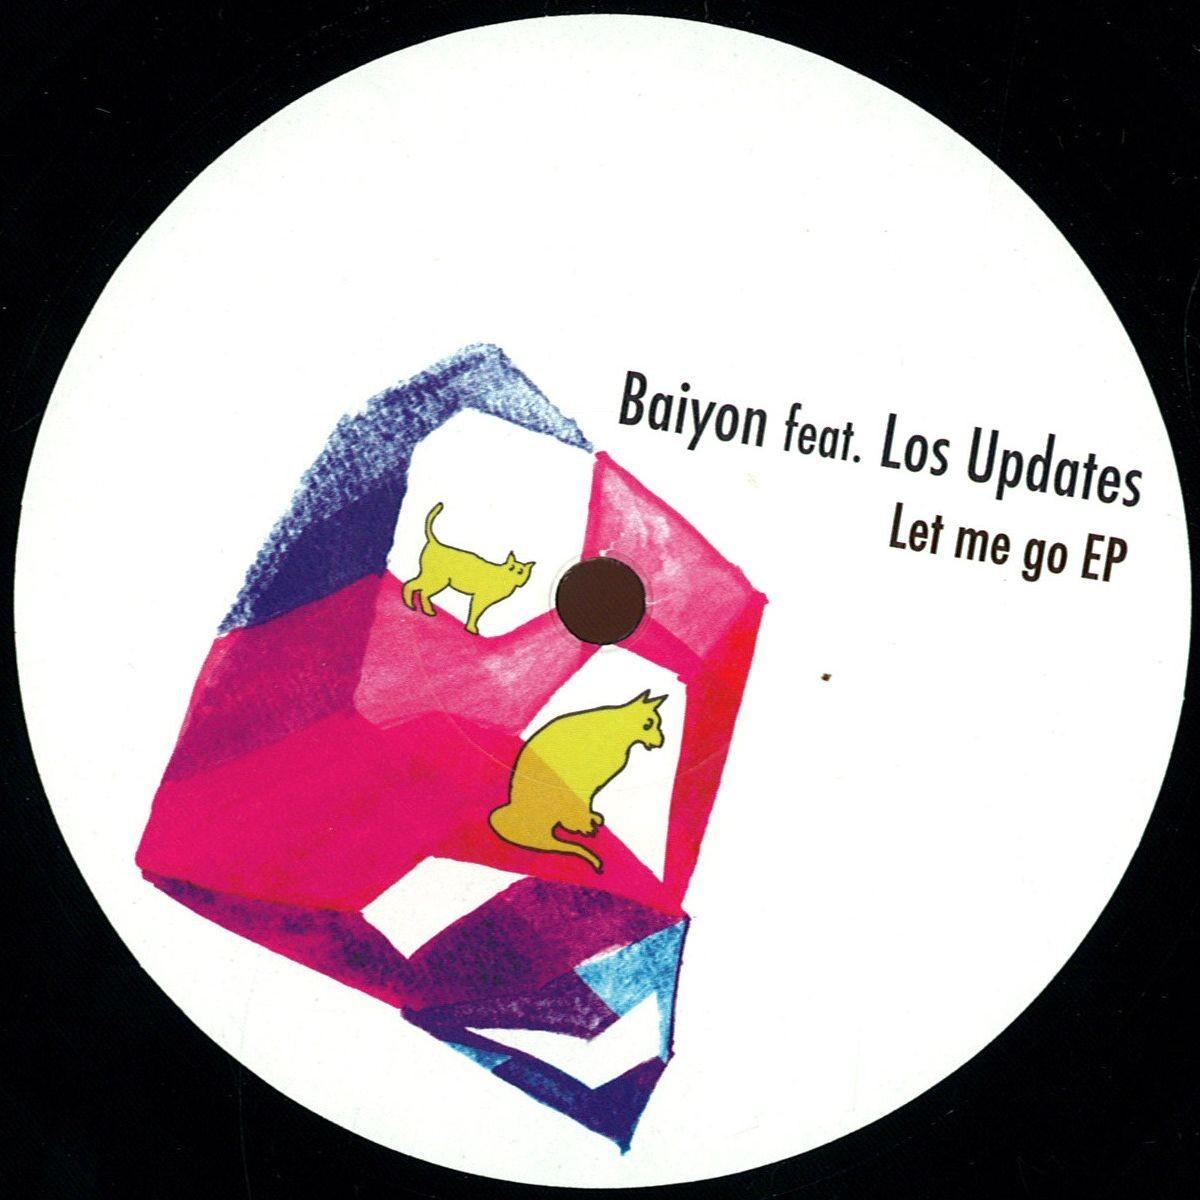 Baiyon feat. Los Updates – Let me go EP